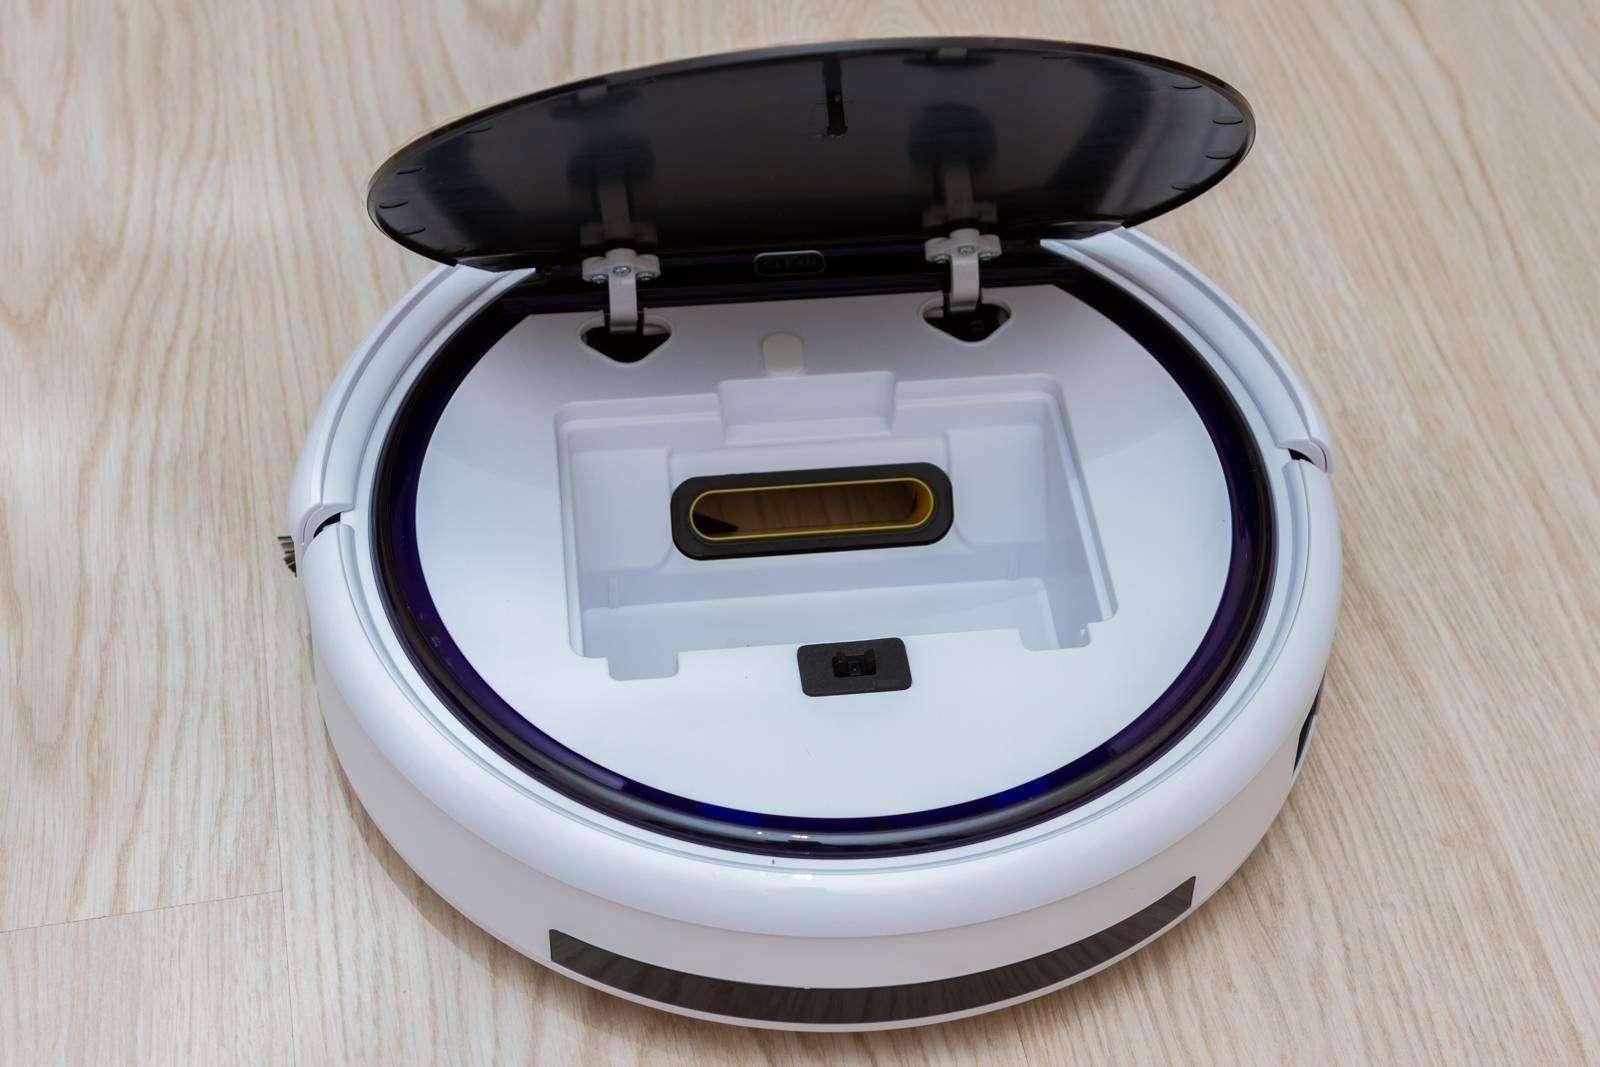 GearBest: Домашний помощник в уборке - ILIFE V5 Pro